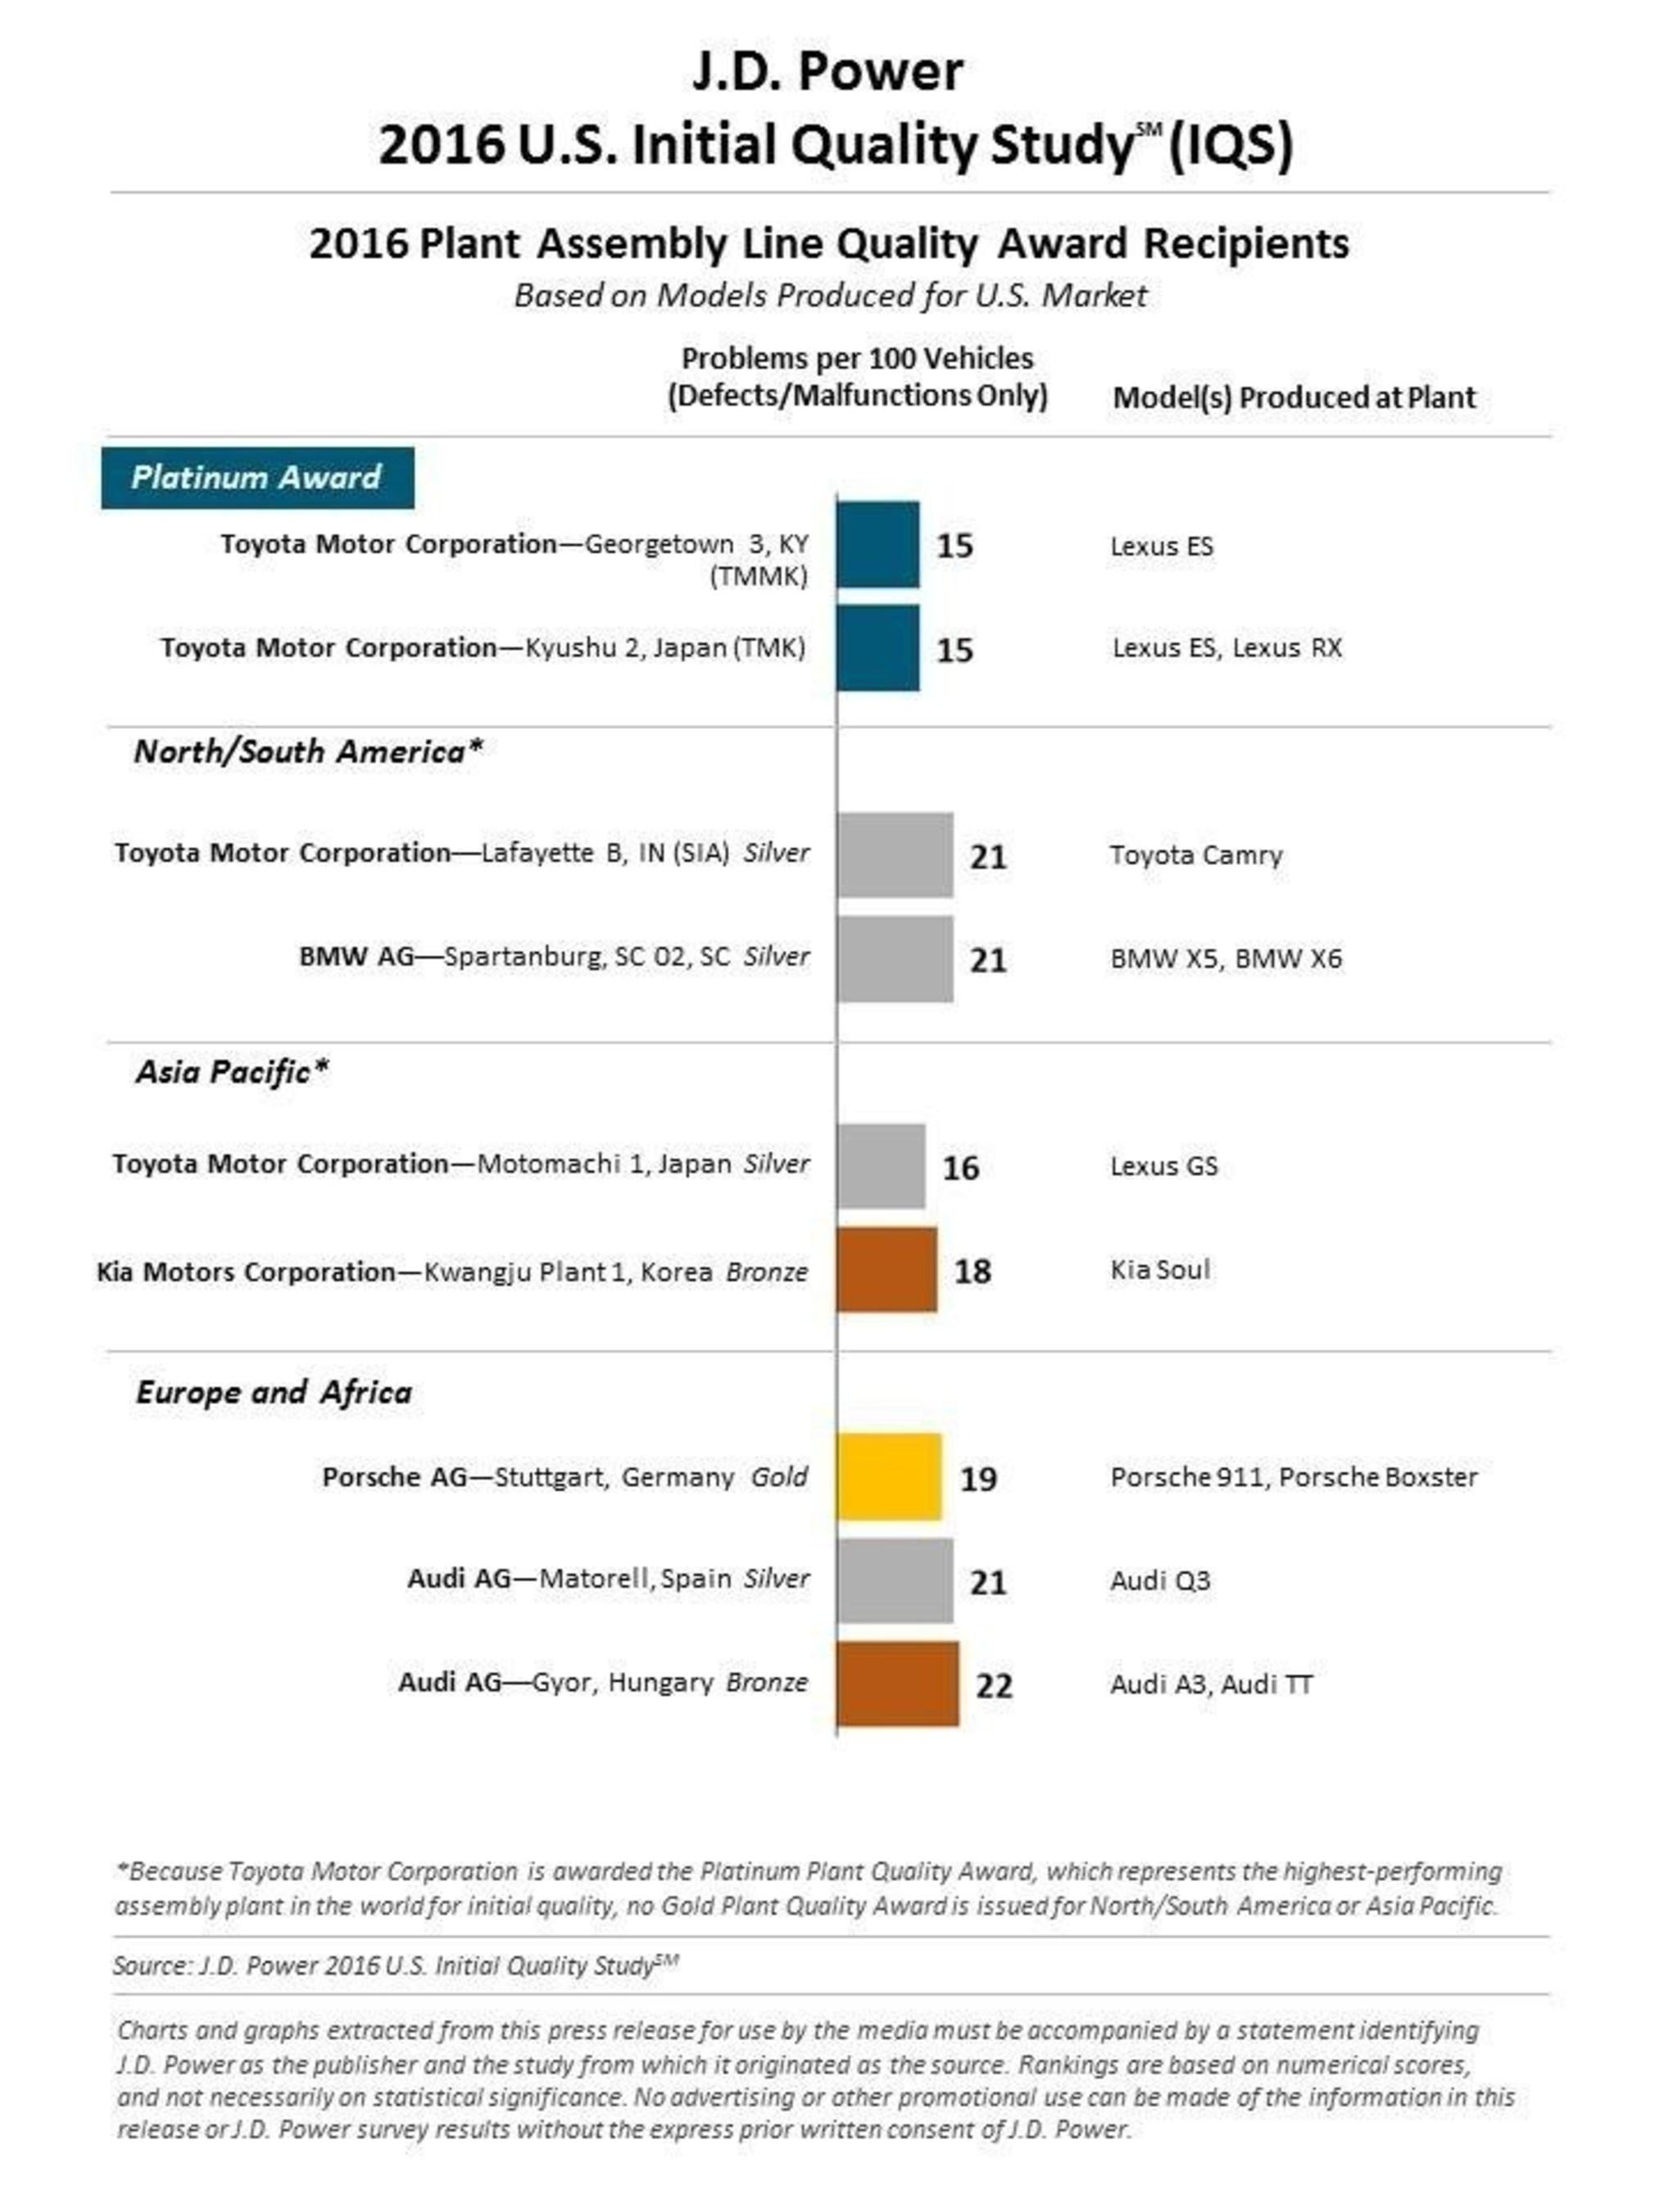 2016 J.D. Power U.S. IQS Plant Quality